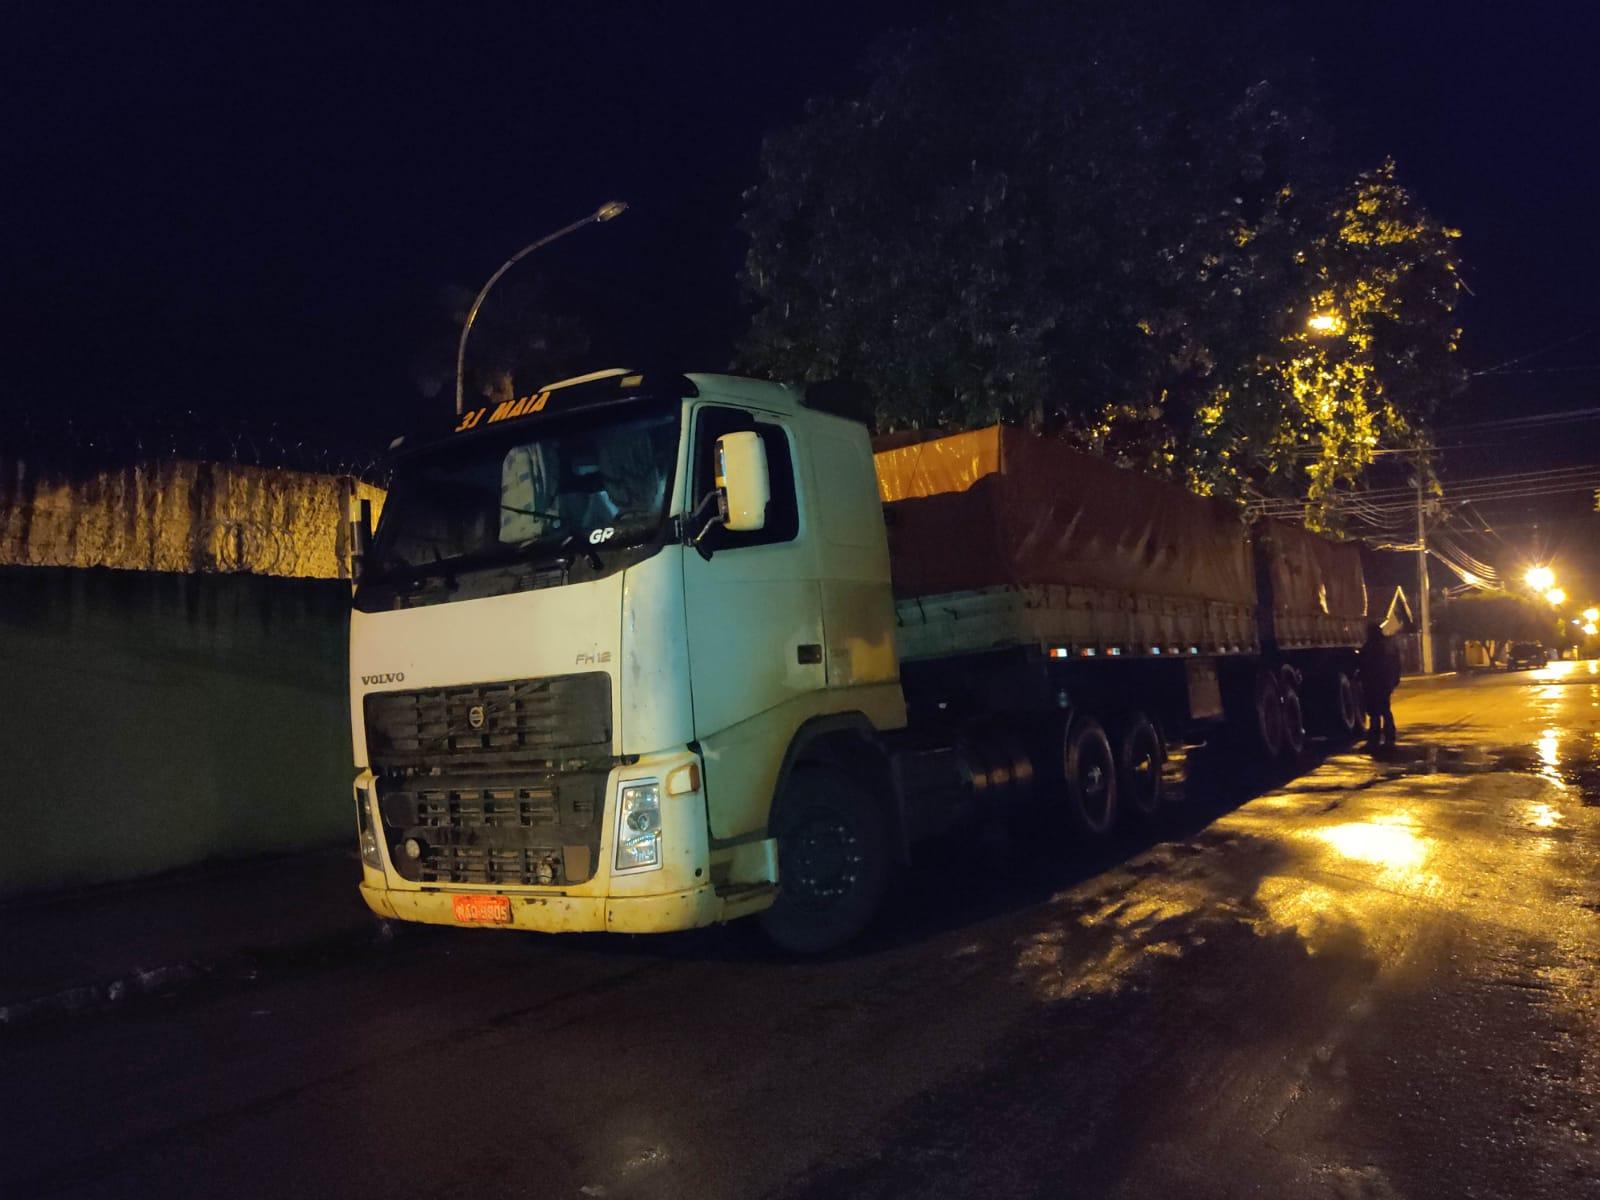 Polícia Civil prende em MT motorista suspeito de furtar carga de soja